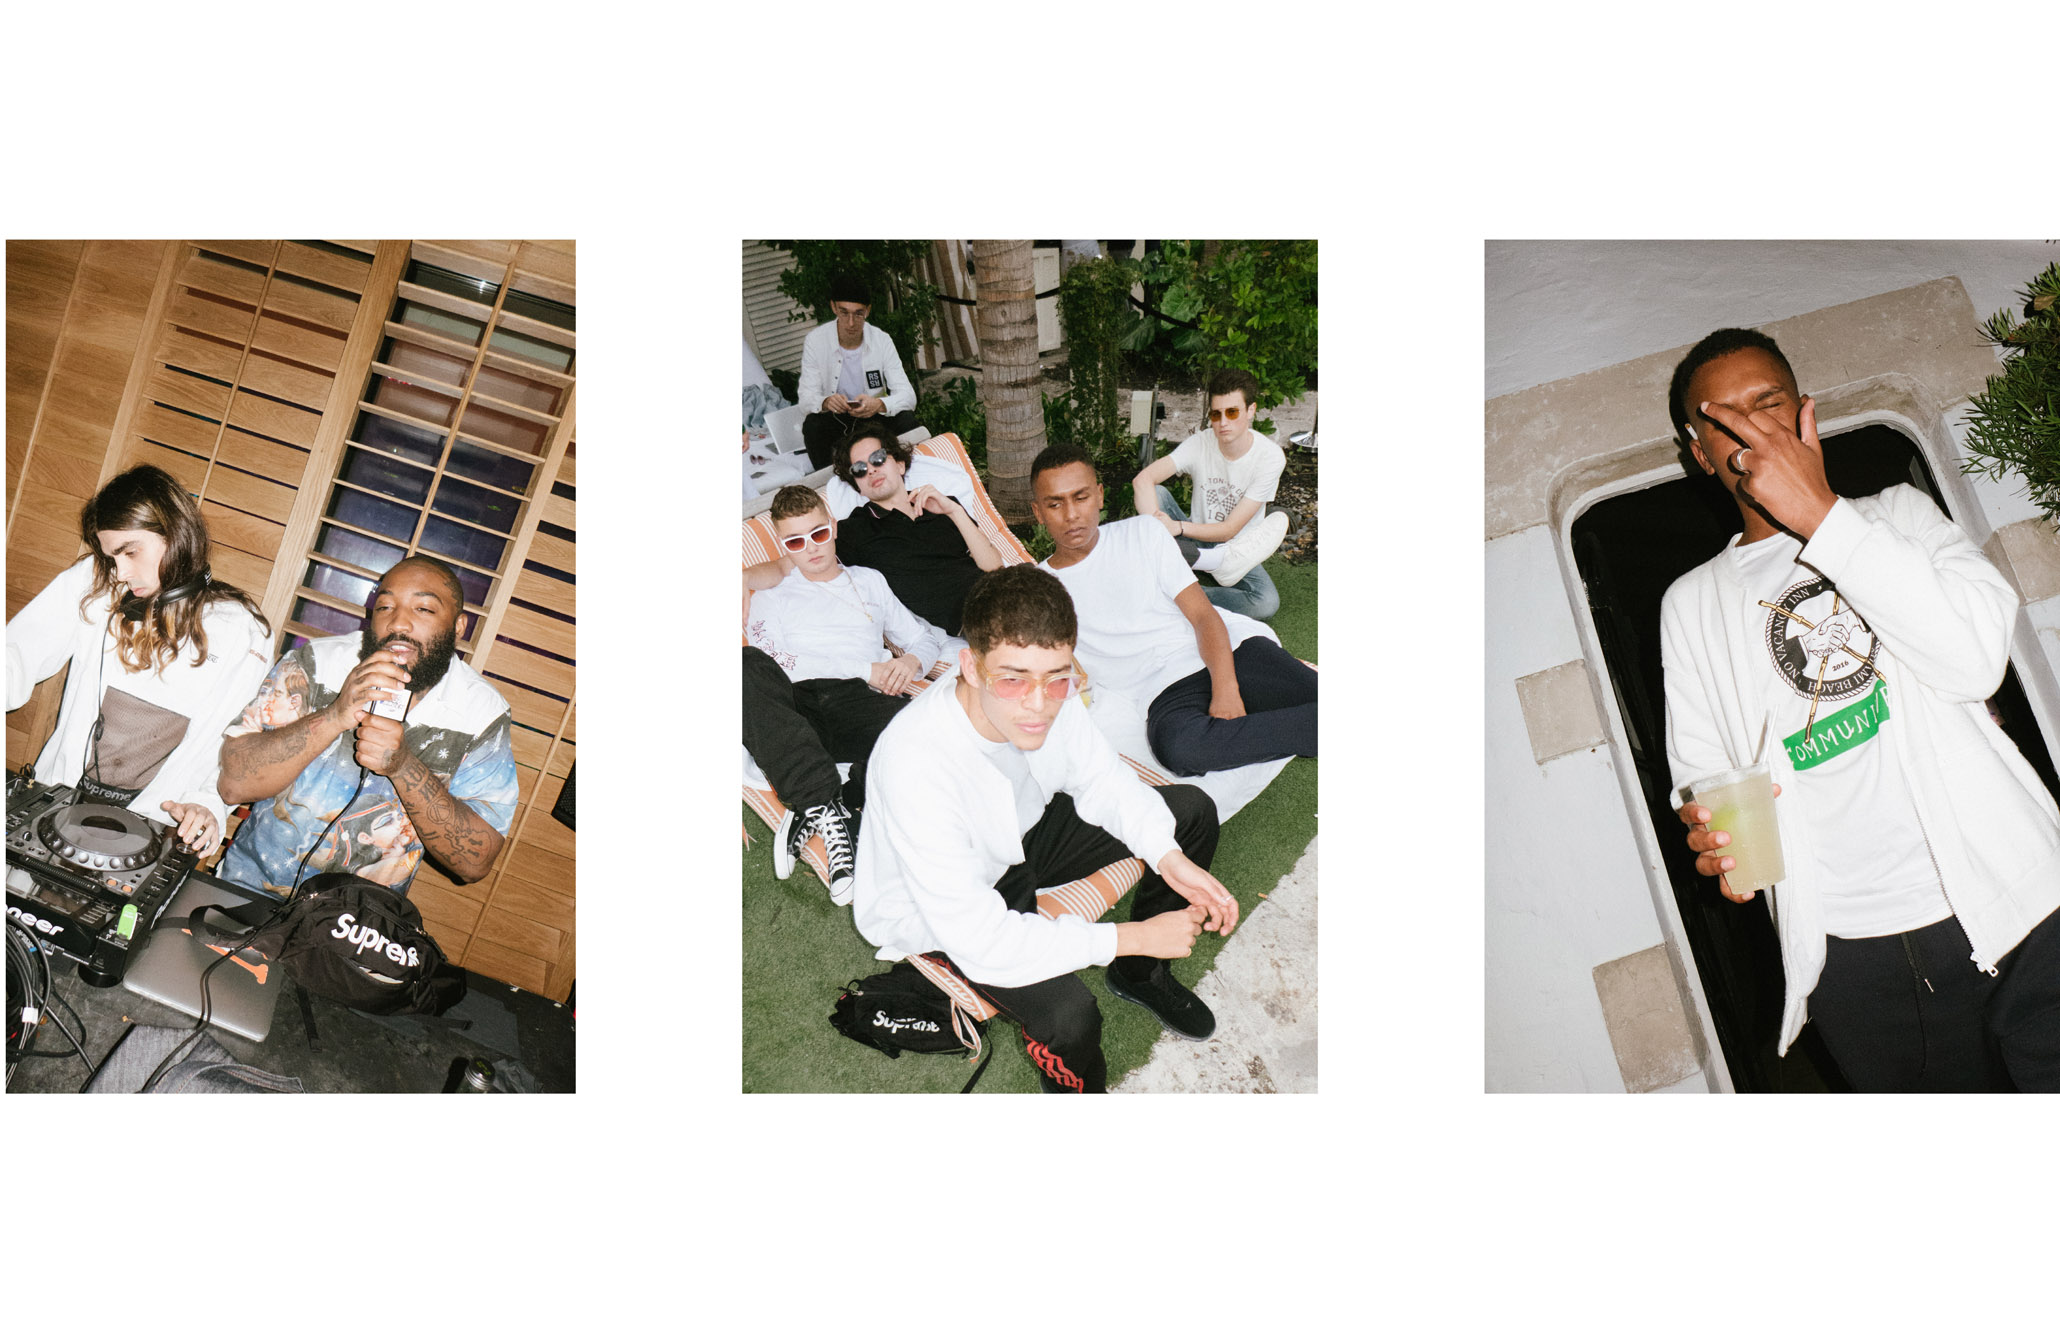 De gauche à droite : Cyber69 avec A$APBari,Raff Law, Gianni Mora, Gleb Kostin, Jonah Levine, Joshua Hercules, Jordan Vickors etJoshua Hercules.